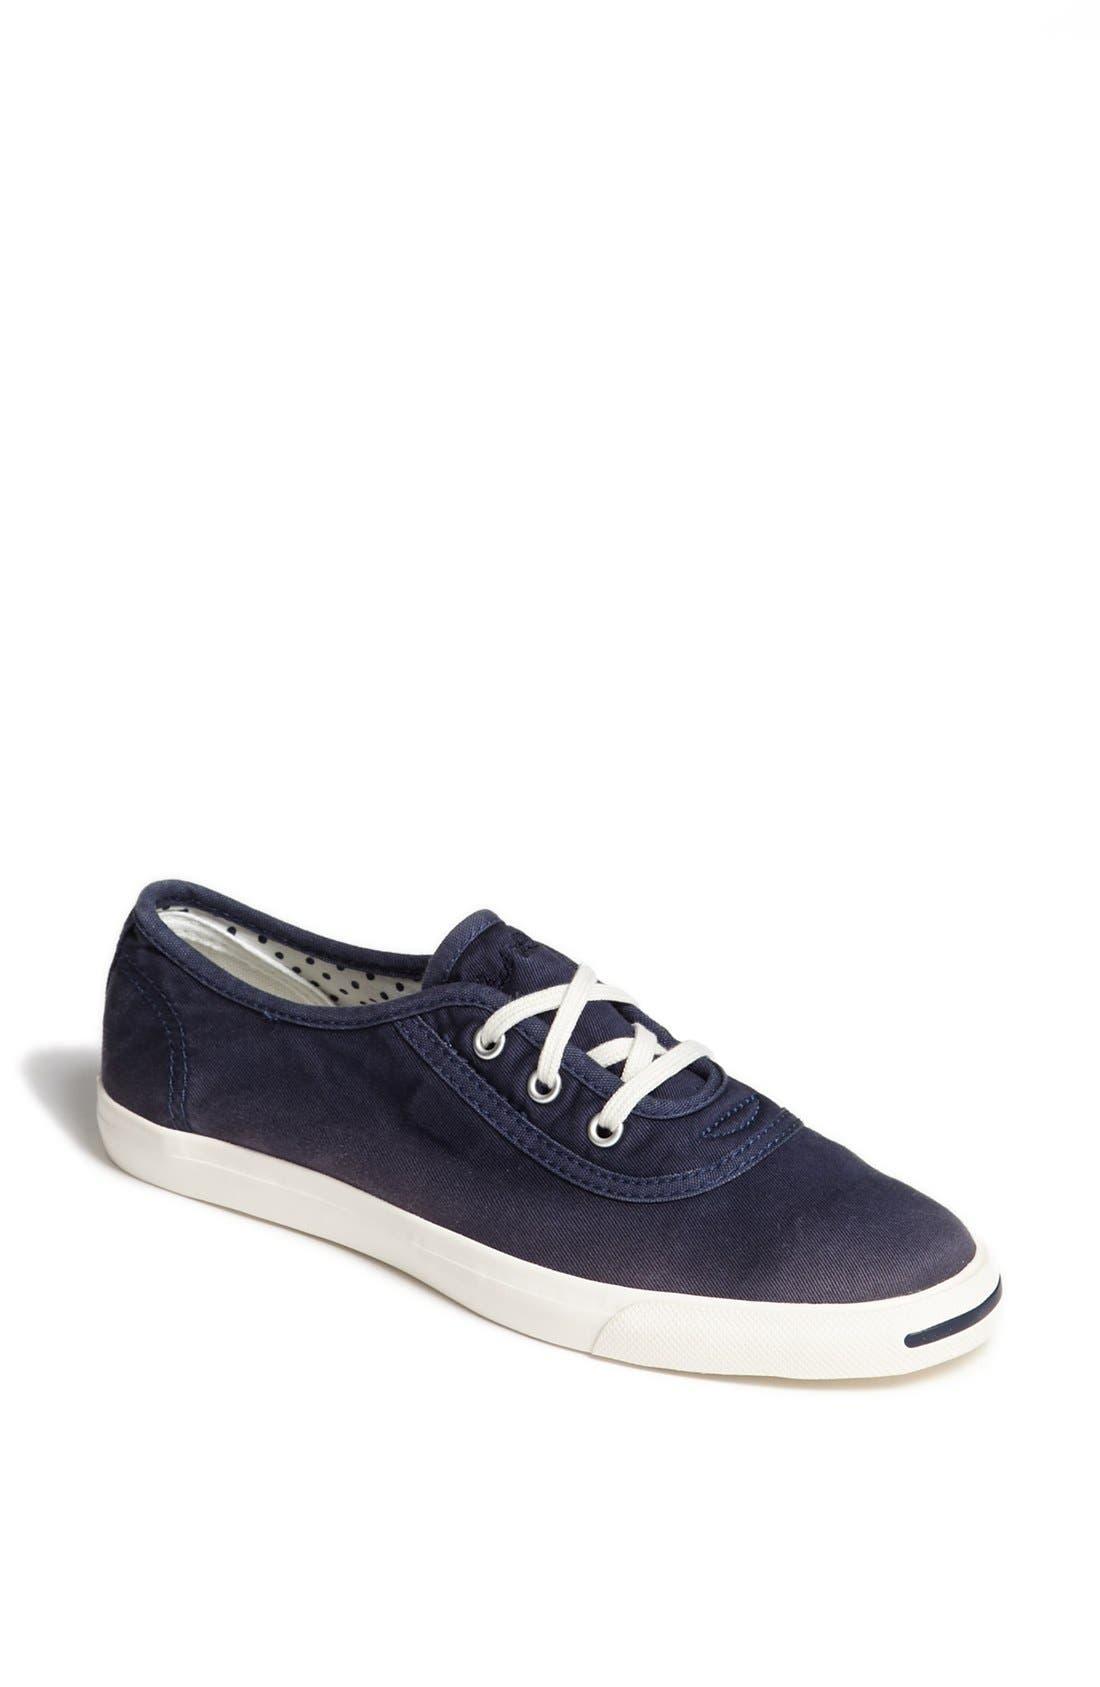 Main Image - Converse 'Jack Purcell - Jane' Sneaker (Women)